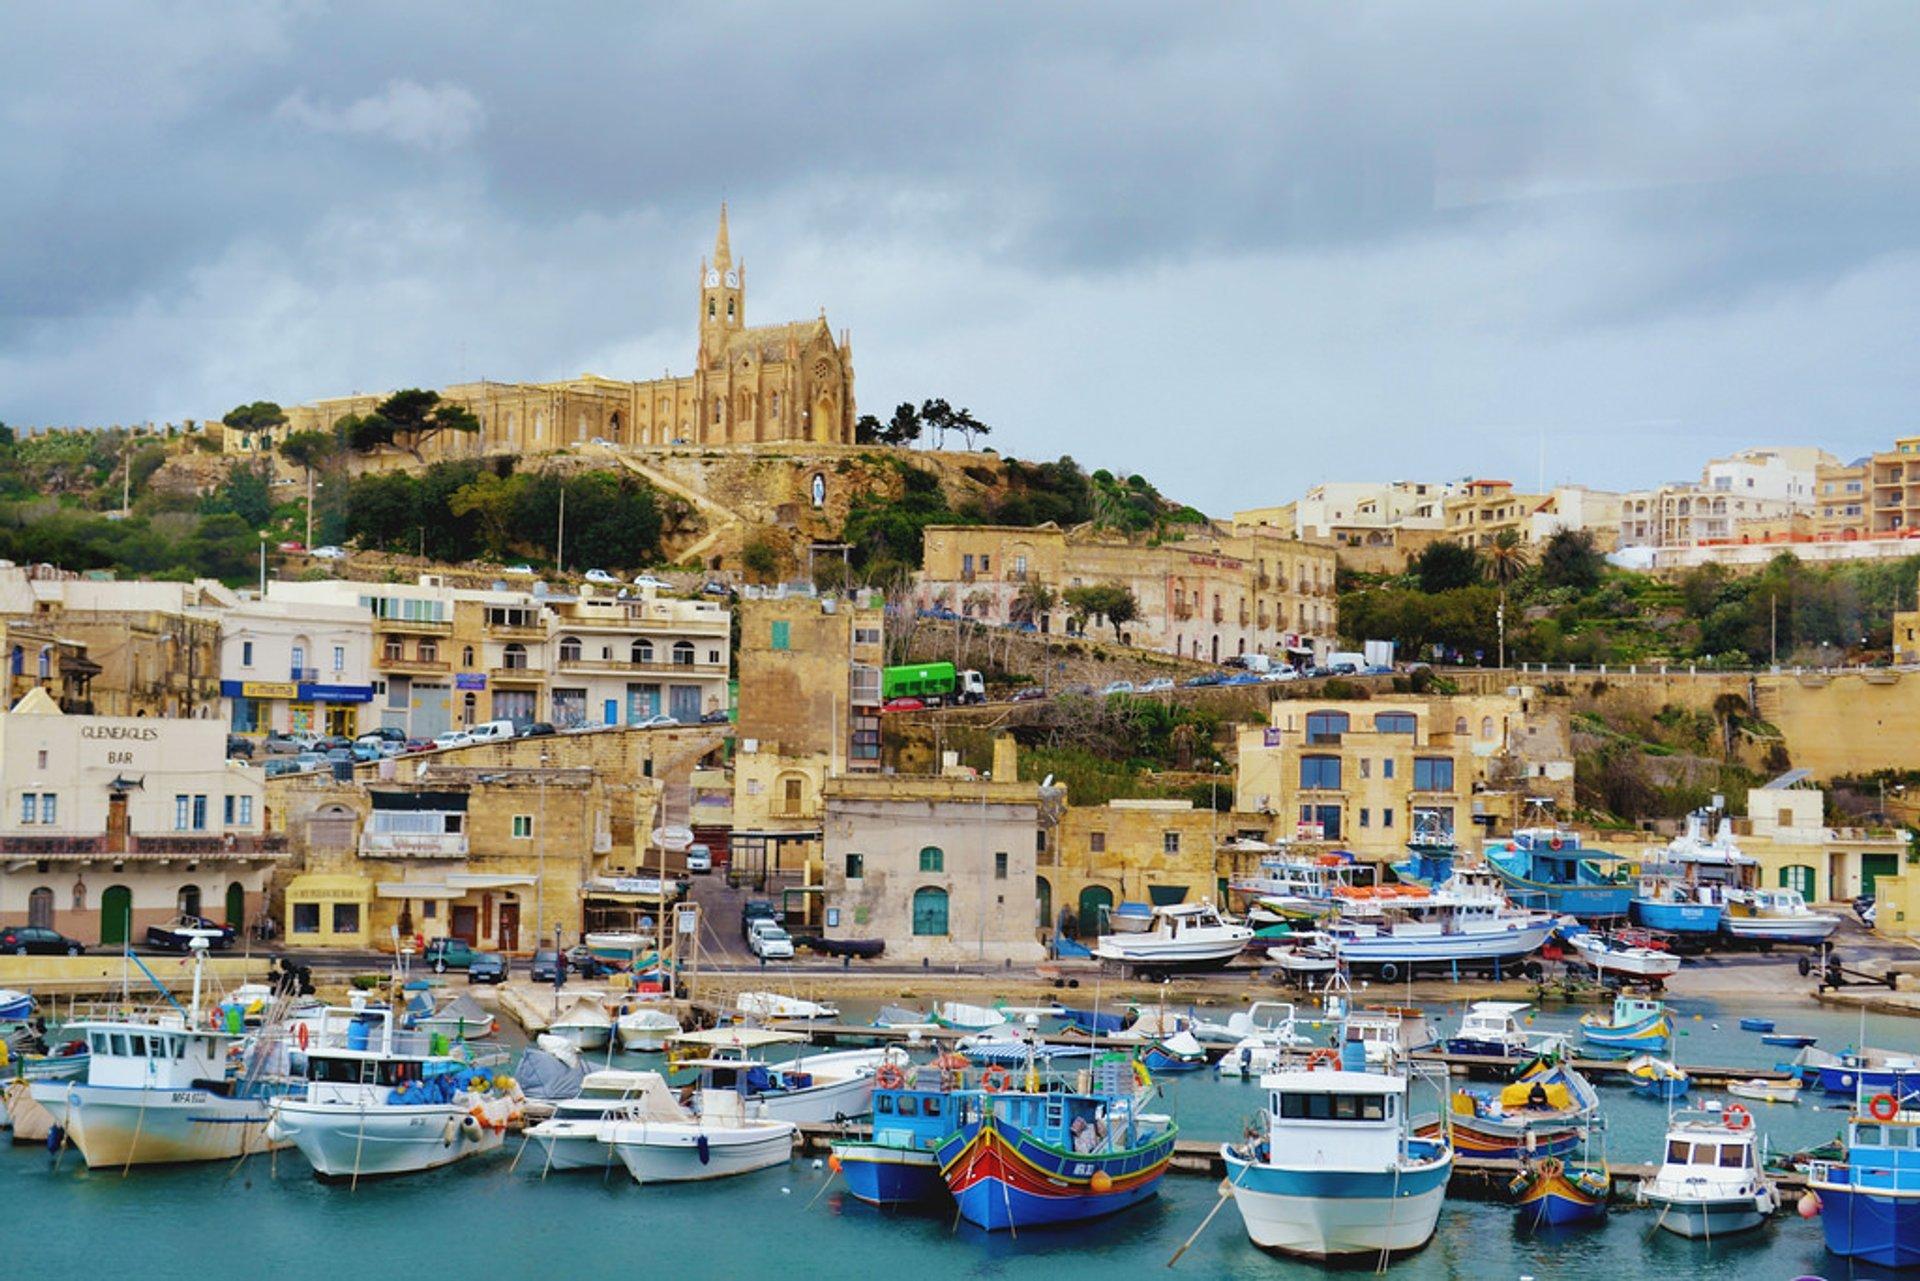 Winter in Malta 2020 - Best Time